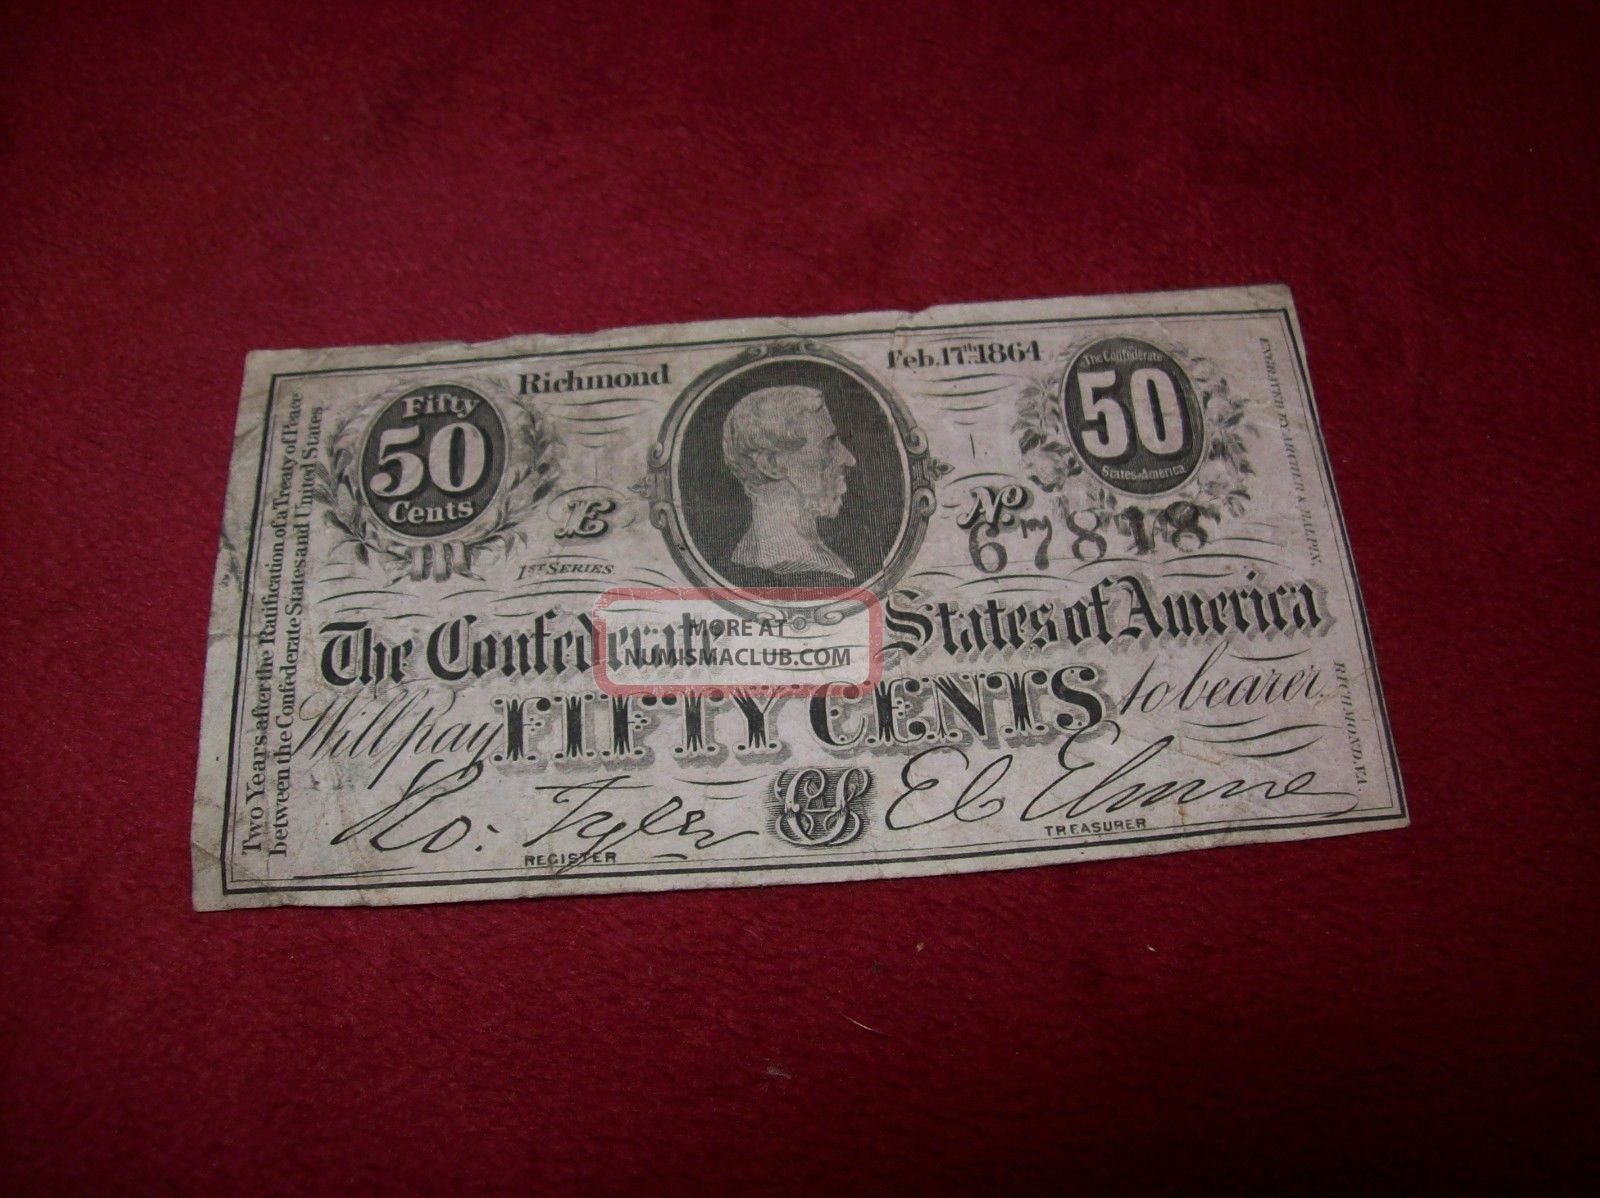 Civil War Confederate States Of America 50 Cent Bank Note,  Richmond,  No.  67818. Paper Money: US photo